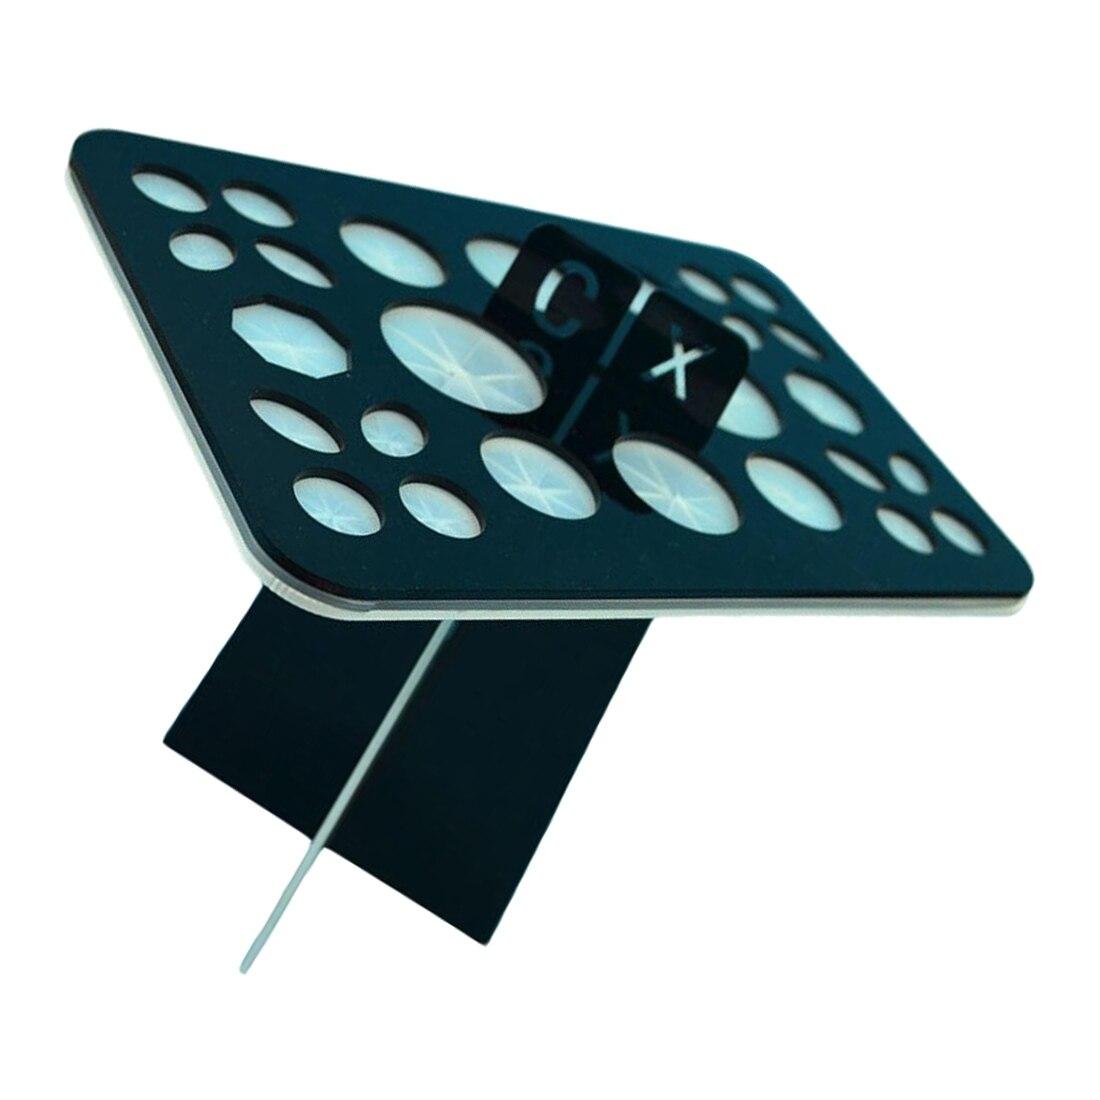 YOST-Acrylic Makeup brush drying rack dry brush holder (Black + White) puff drying holder 2pcs